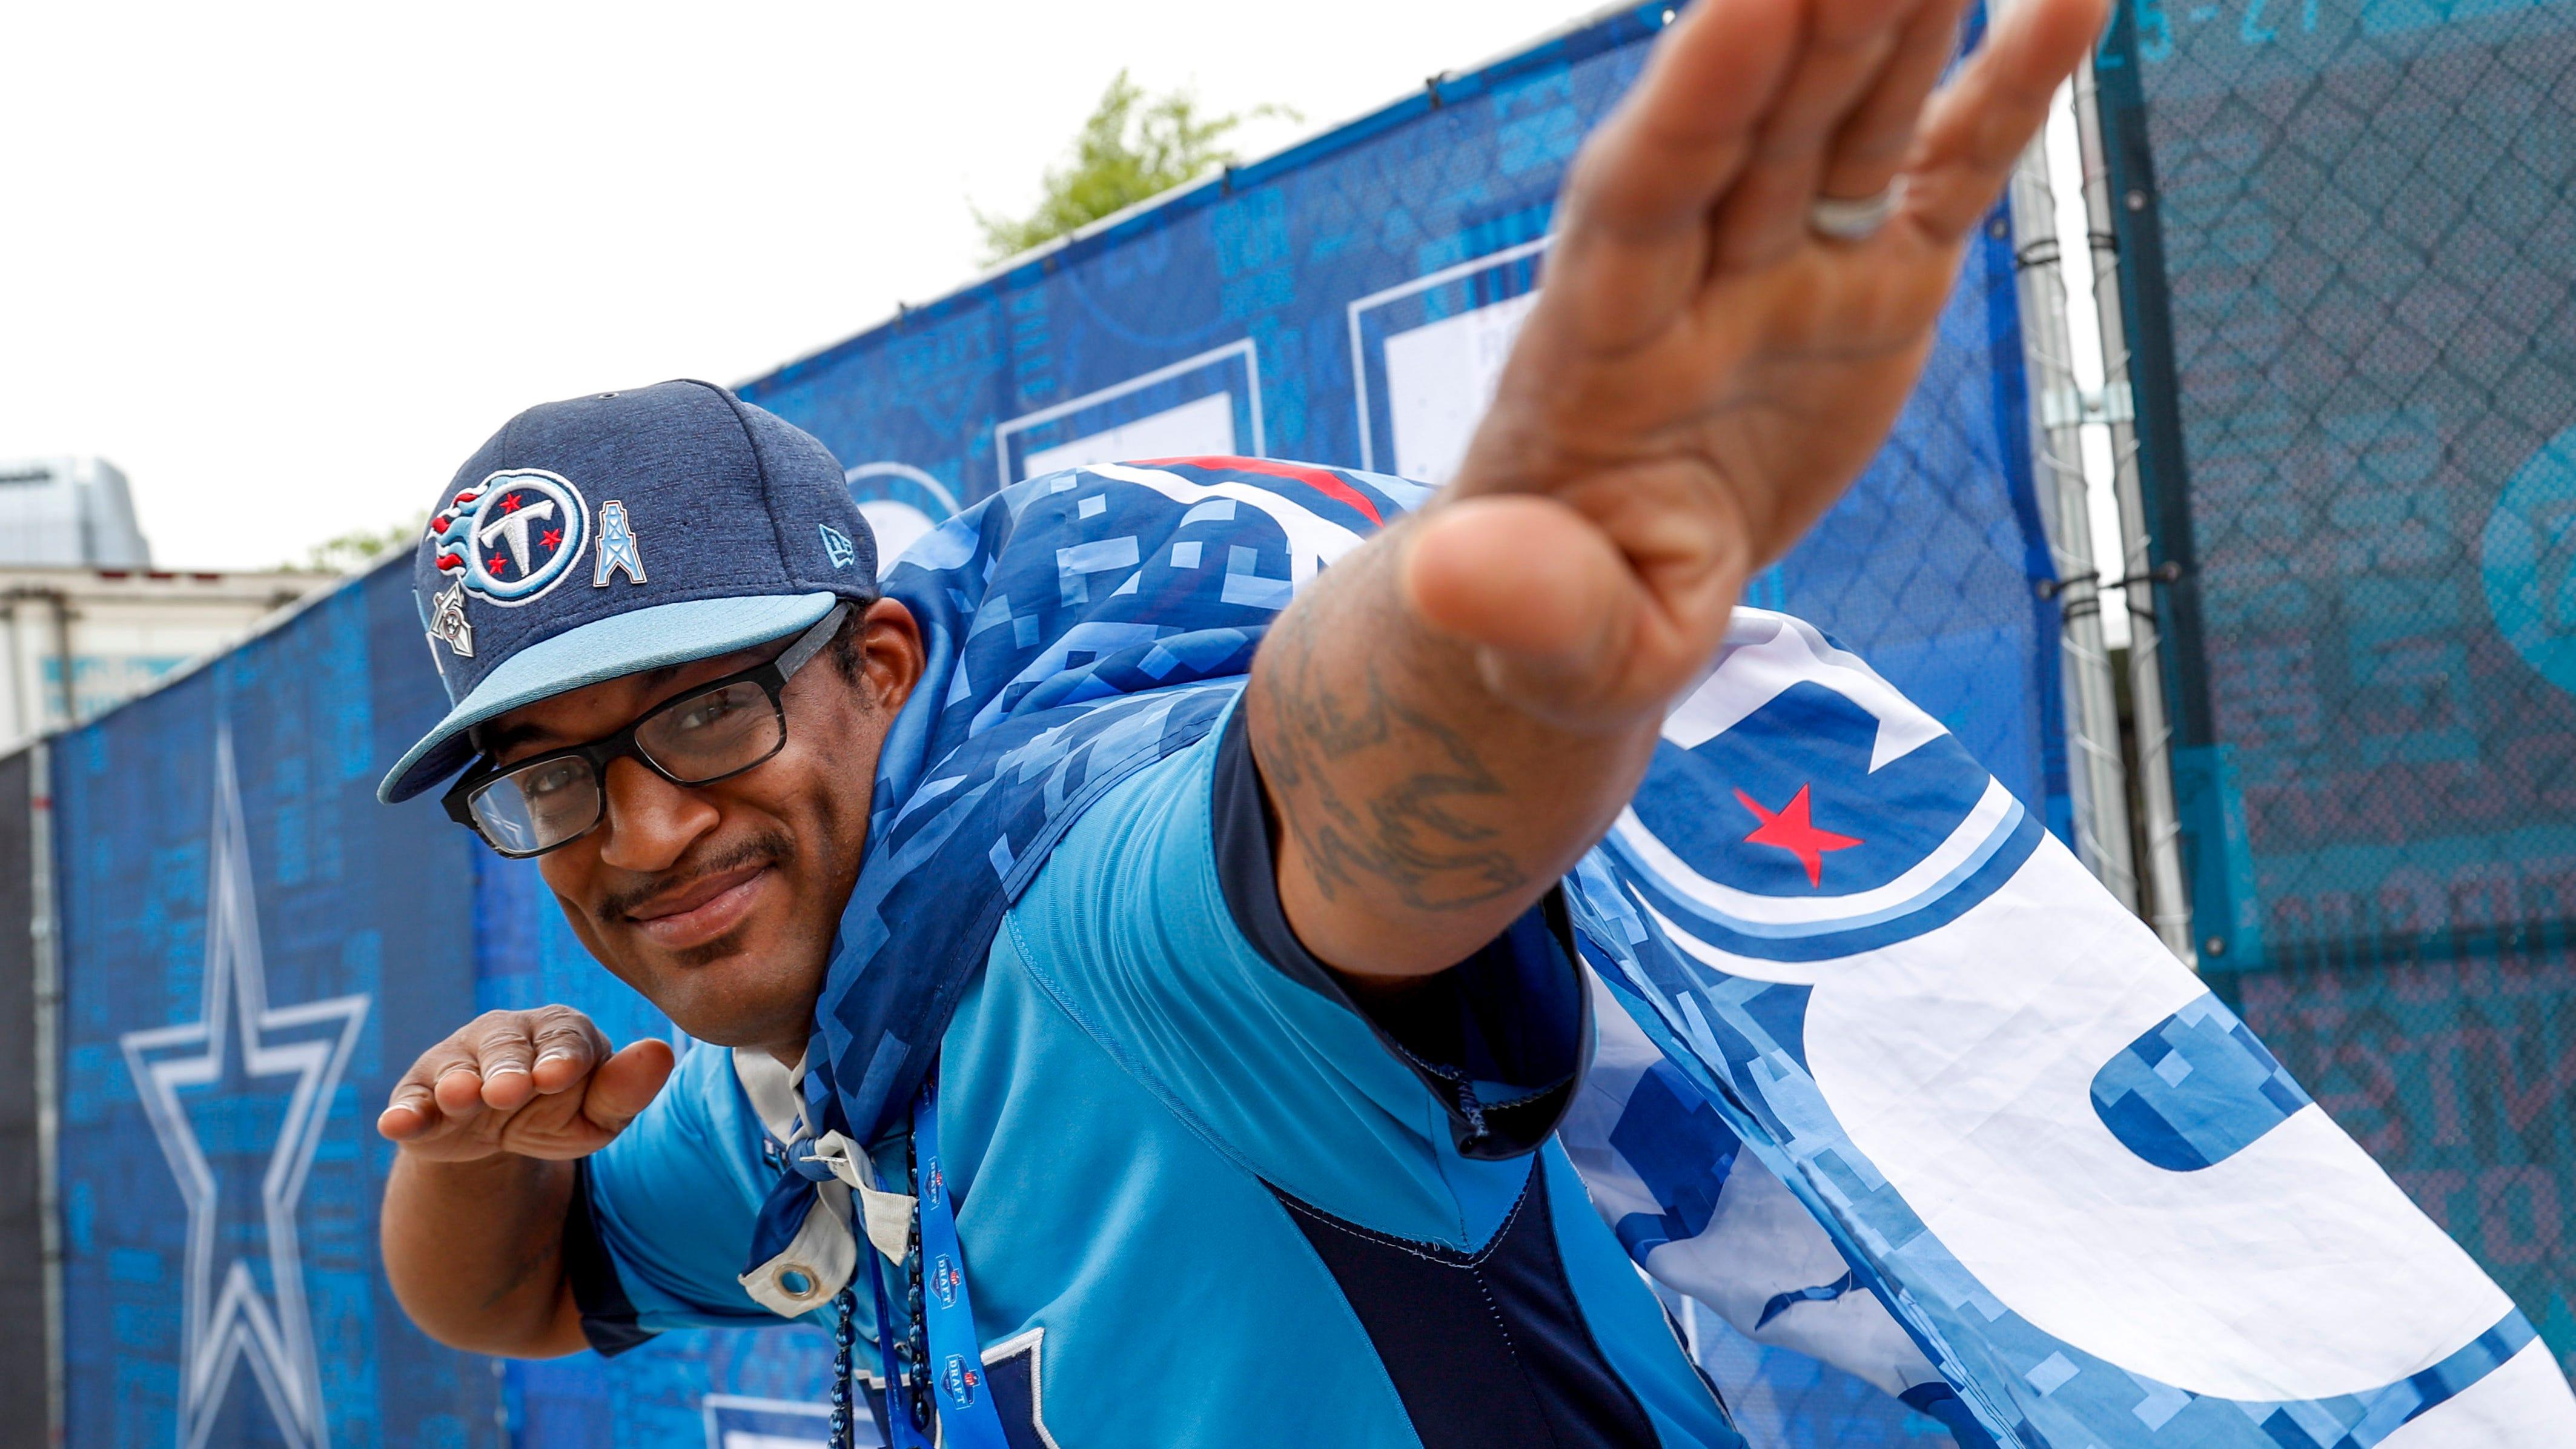 Antonio Osborne strikes a pose in full Titans garb during the NFL Draft Experience at Nissan Stadium in Nashville, Tenn., on Thursday, April 25, 2019.